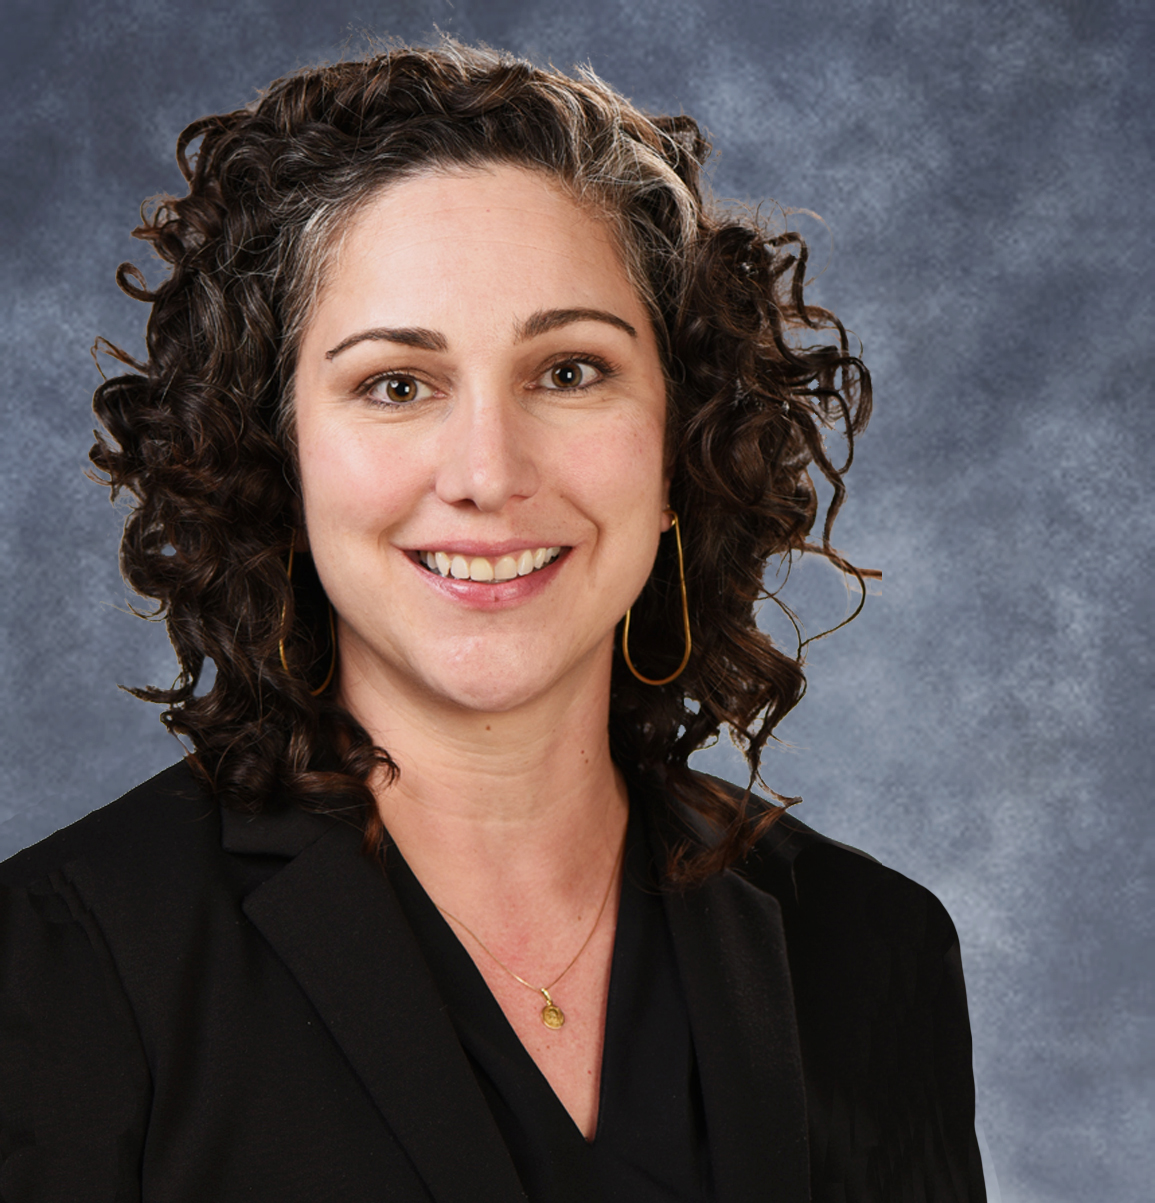 Susan McKernan, DMD, MS, Phd